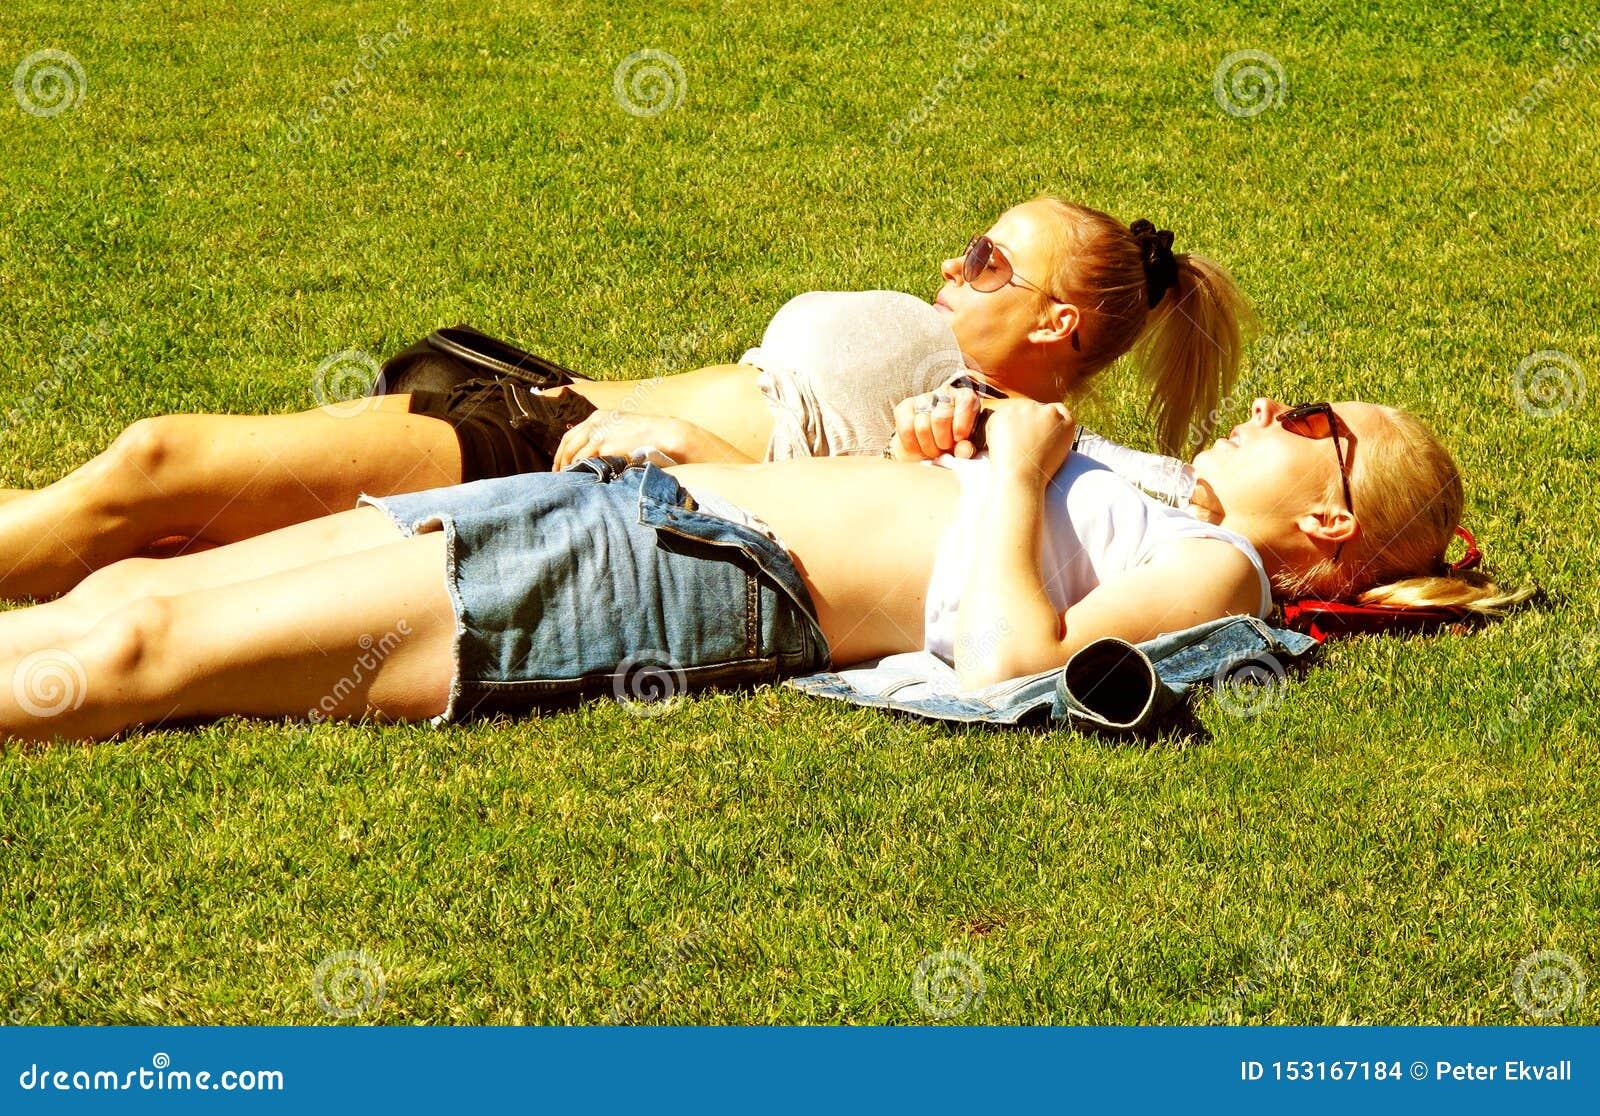 Two girls sunbathing in central park